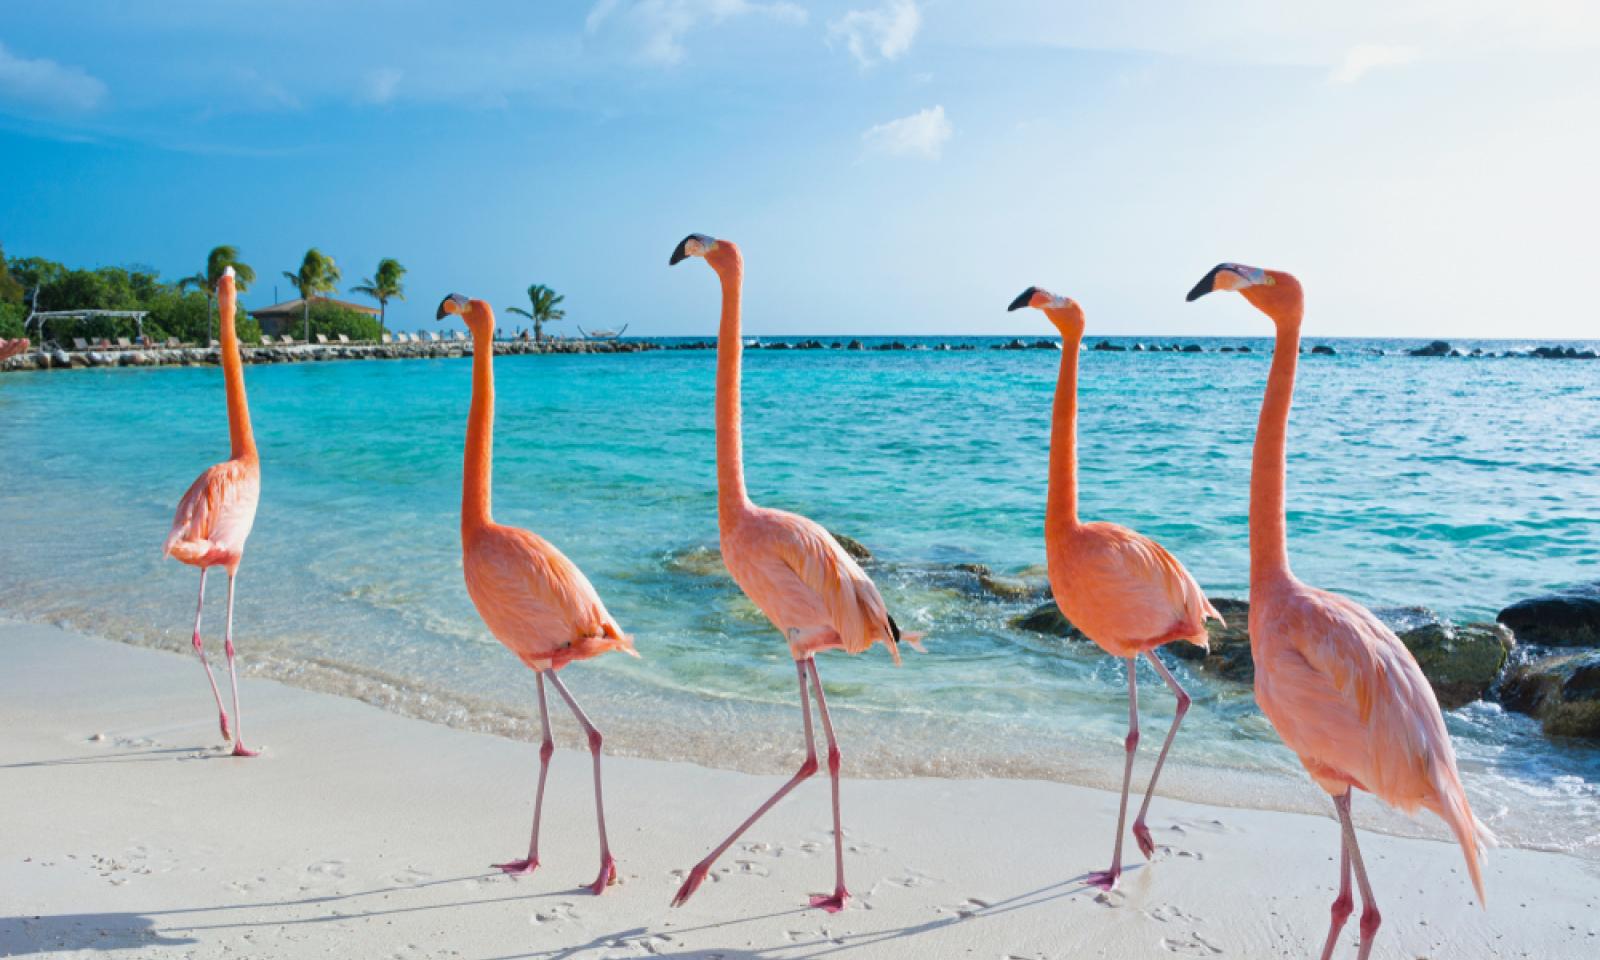 Plaměňáci na pláži